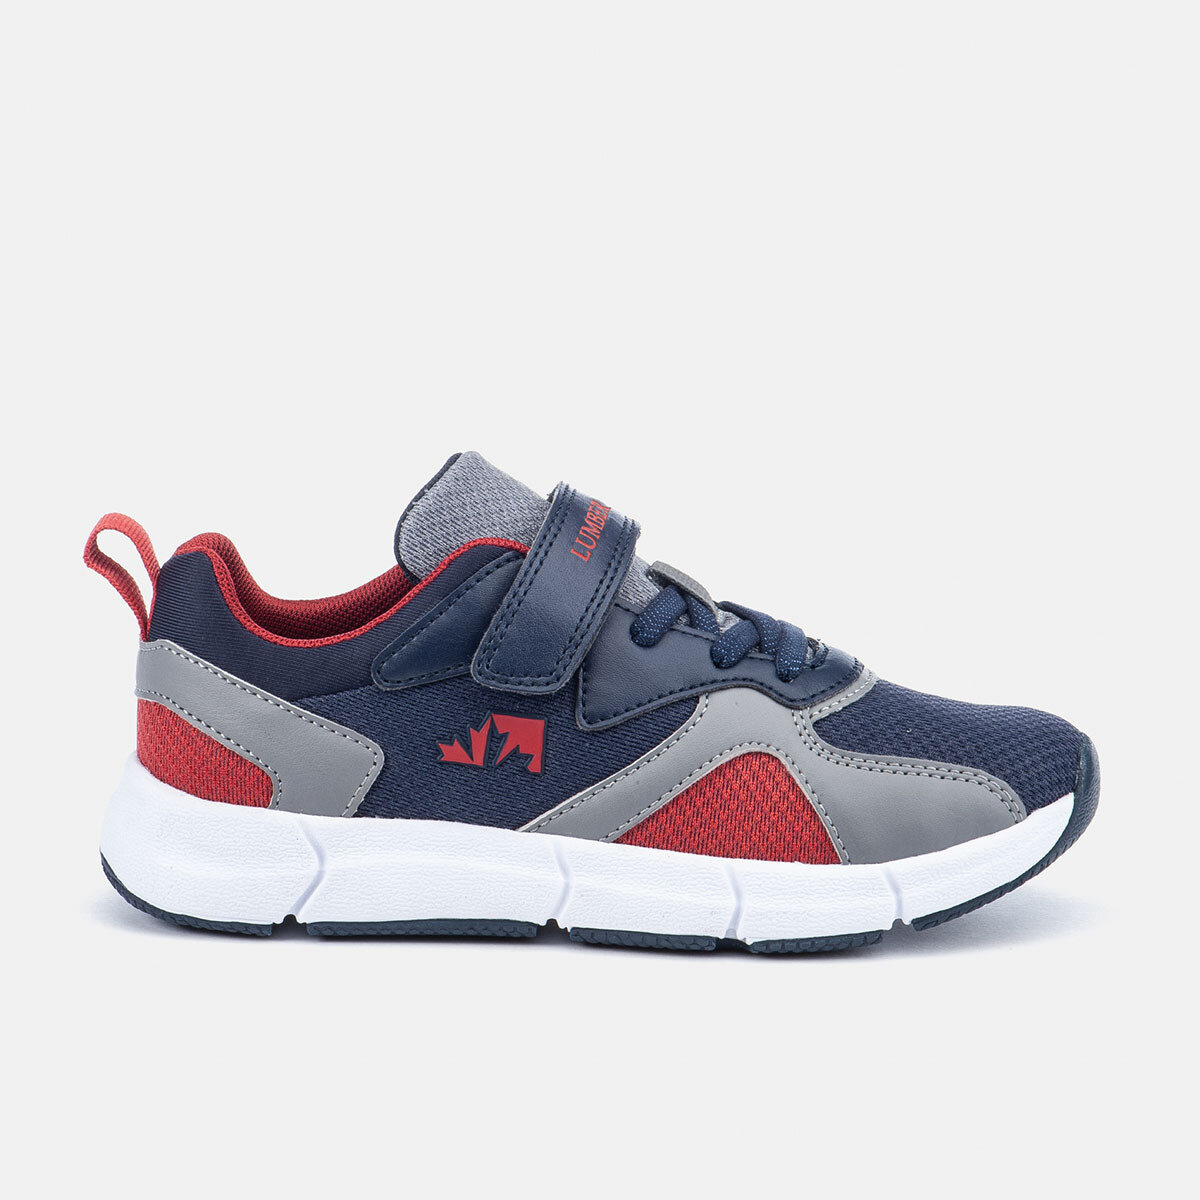 BEAVER NAVY BLUE/GREY/RED Boy Running shoes